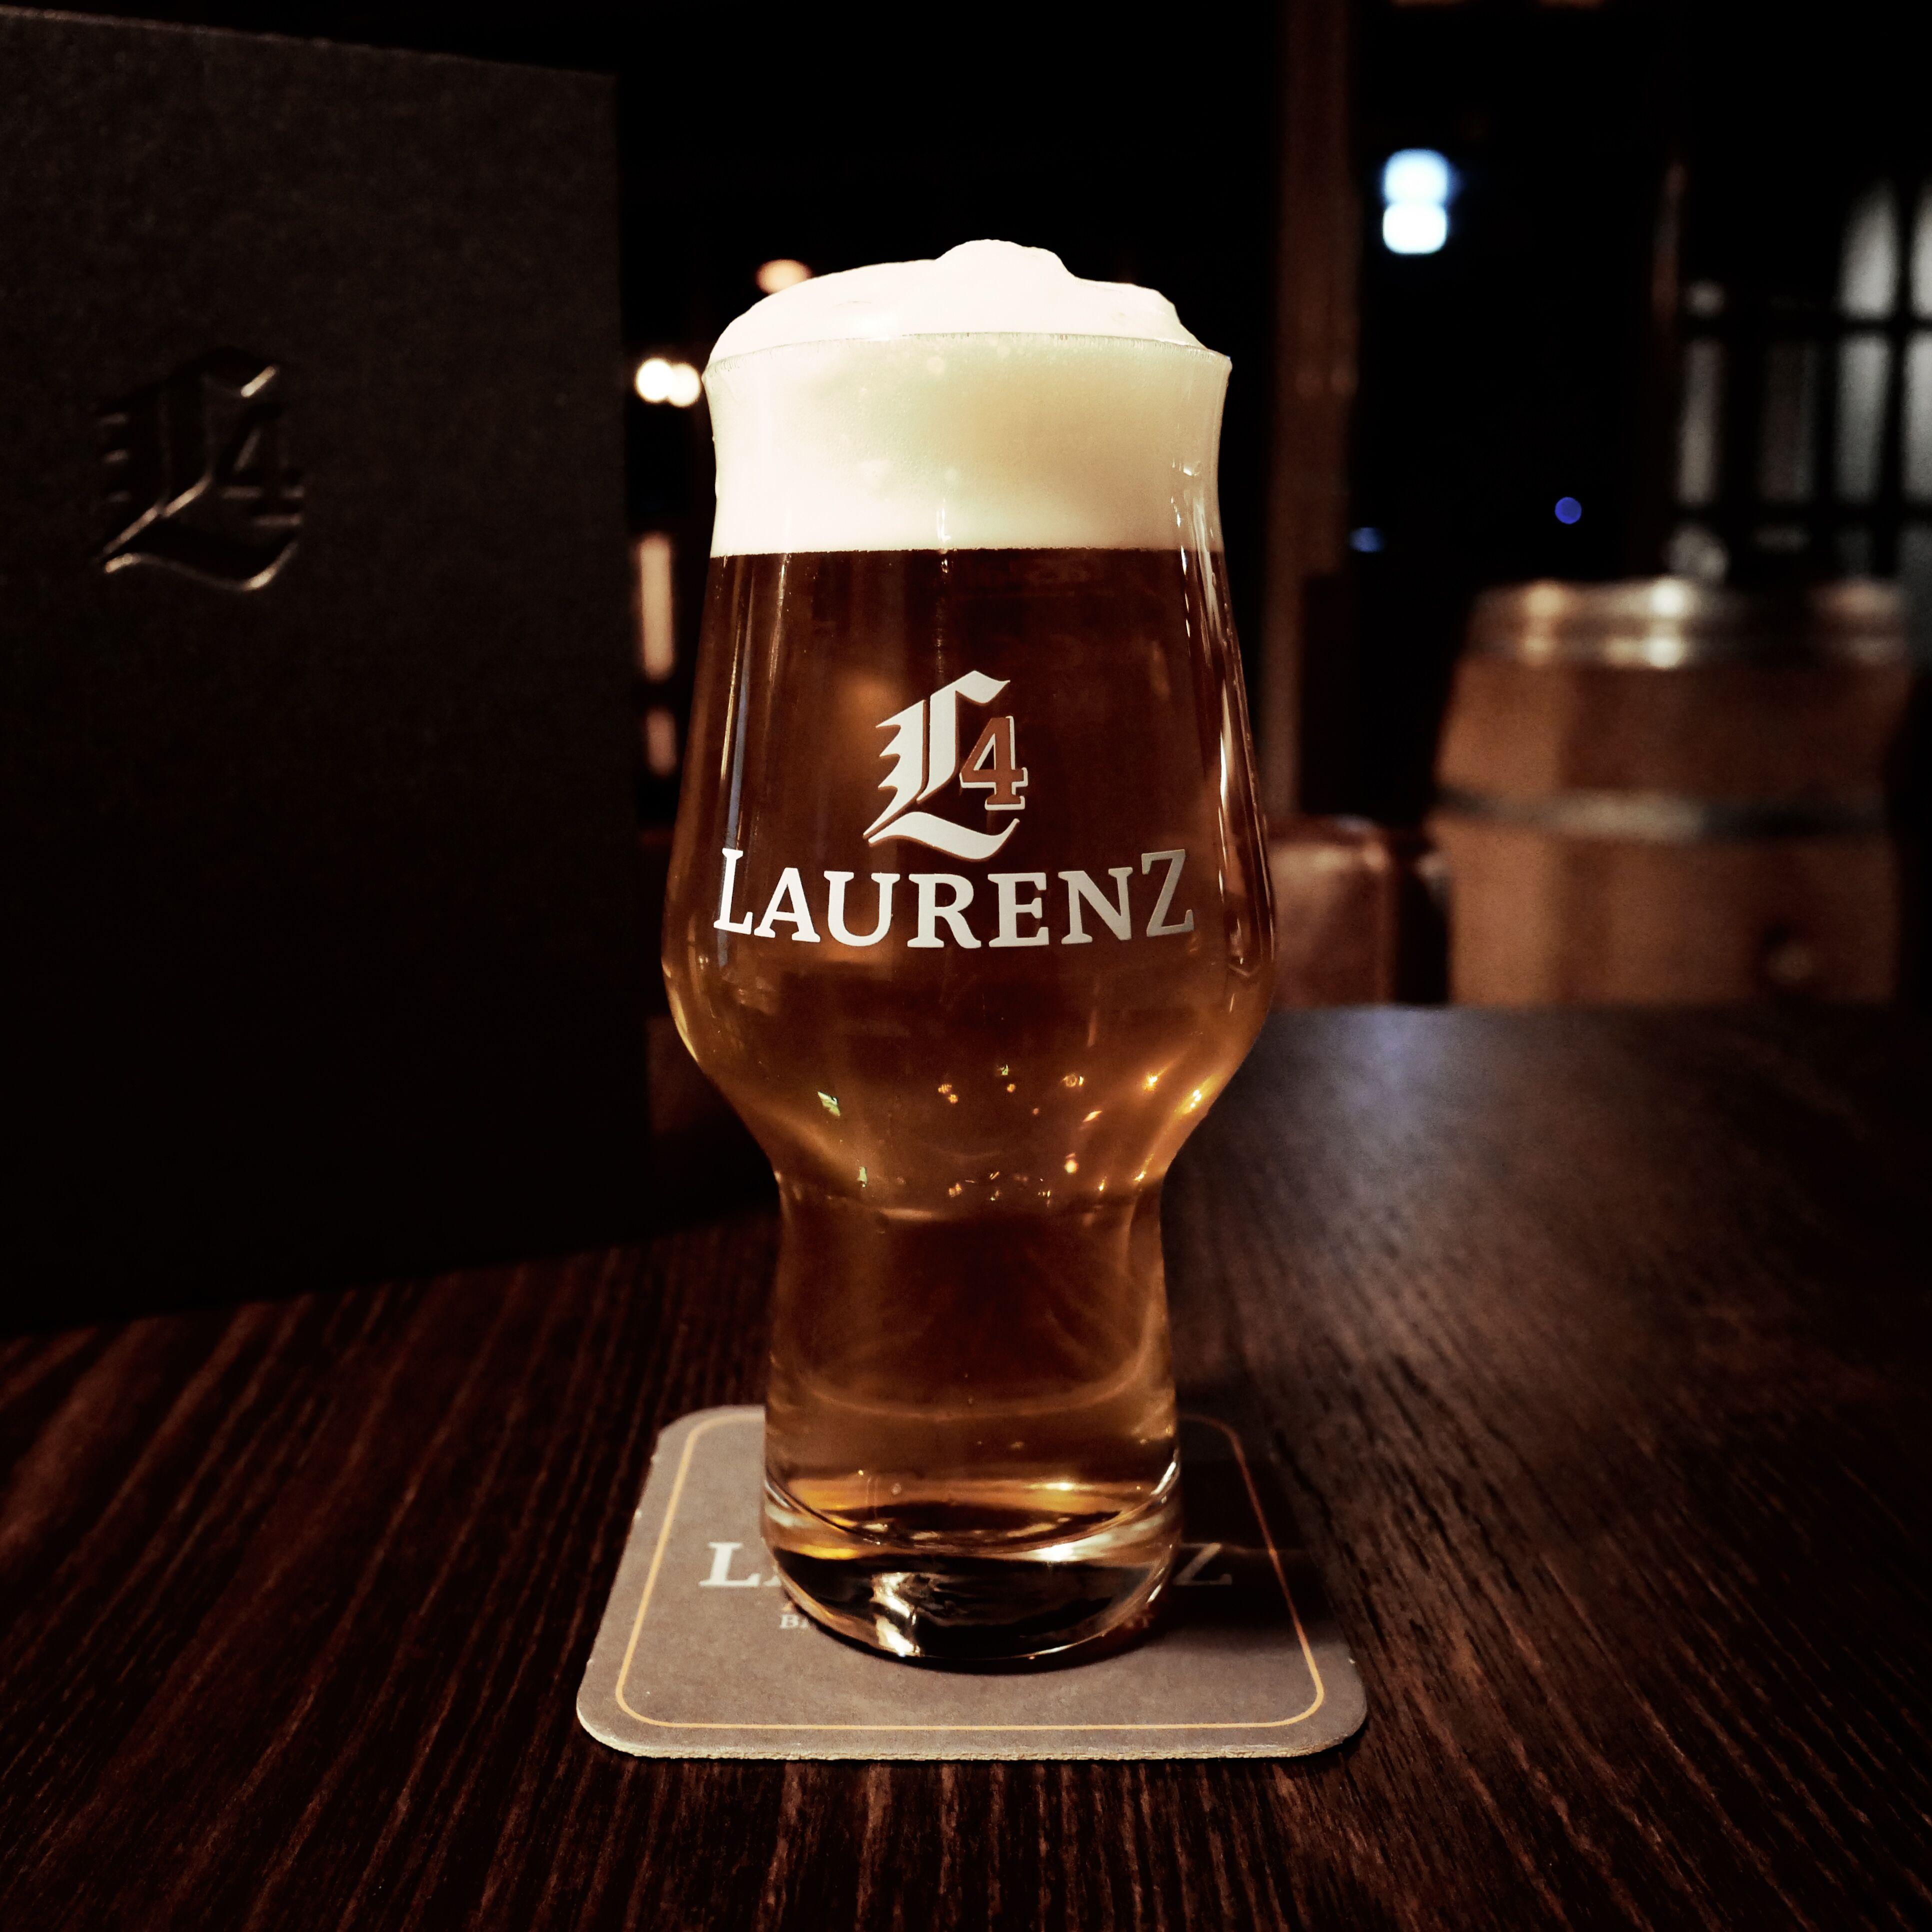 1+1 Gratis Bier im Laurenz, 1050 Wien (Mo-Sa 17:00 - 00:00 bis 15.07.2019)